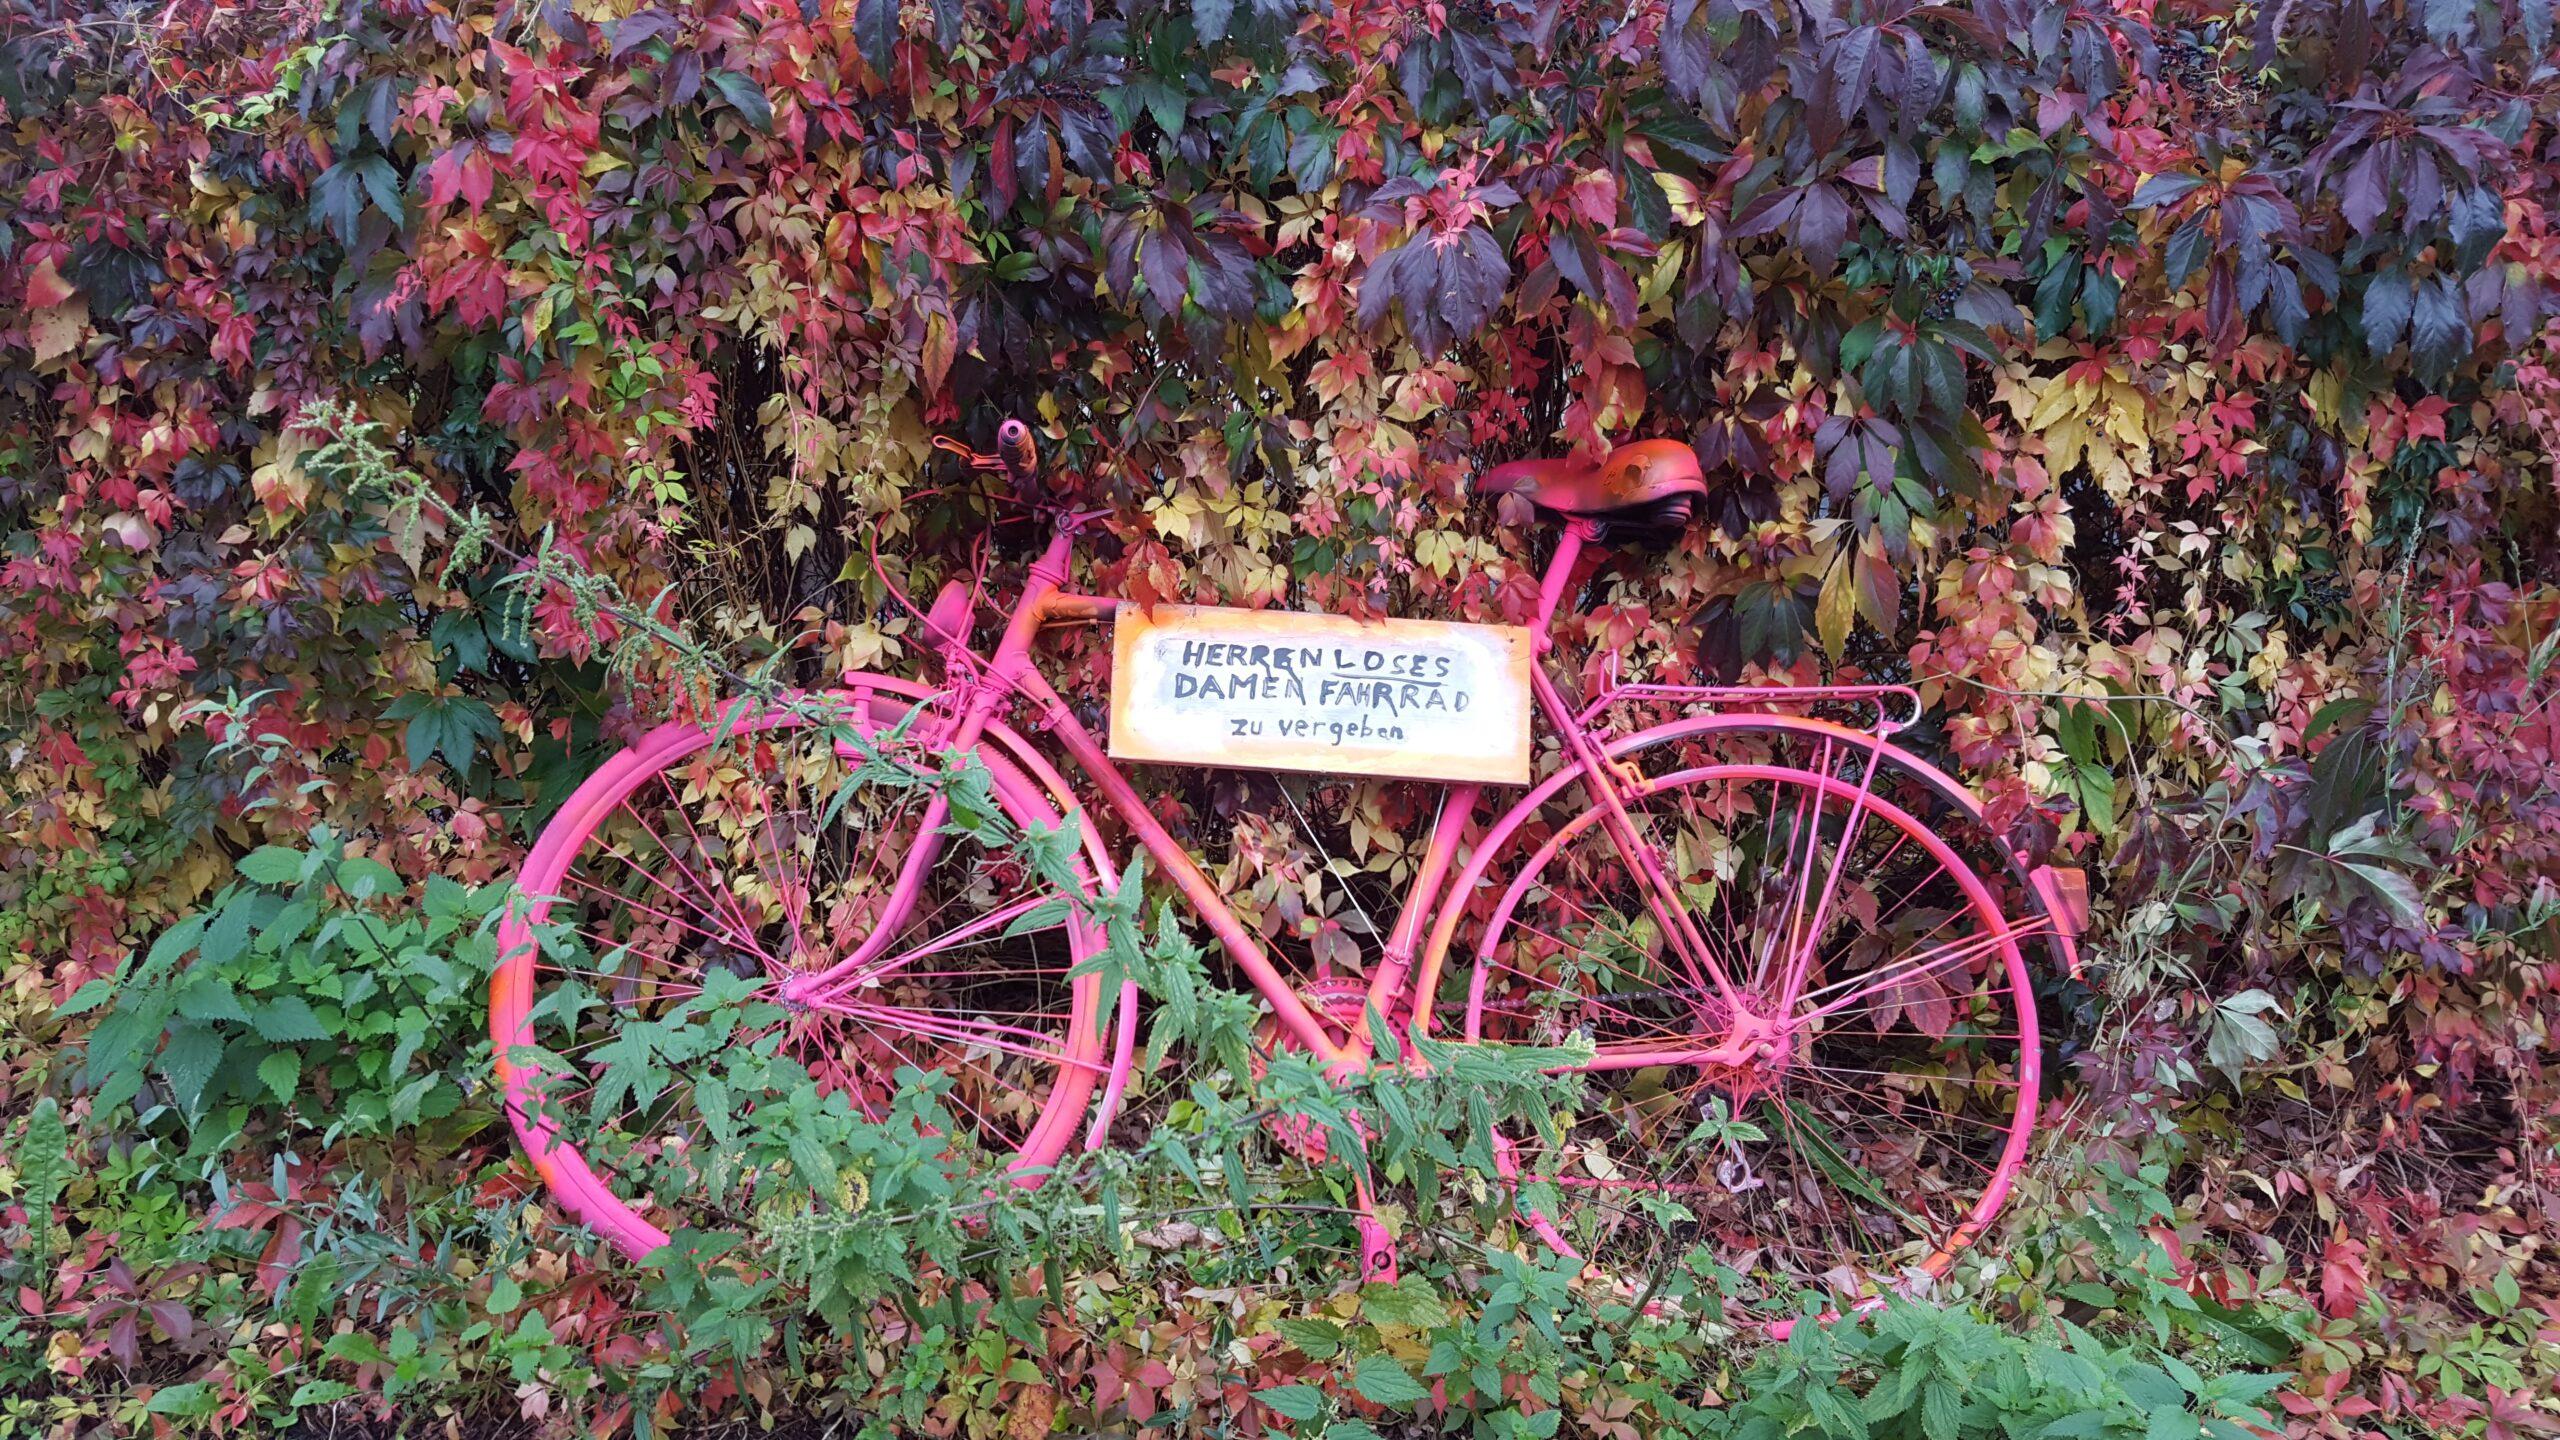 Herrenloses Fahrrad vor Herbstlaub